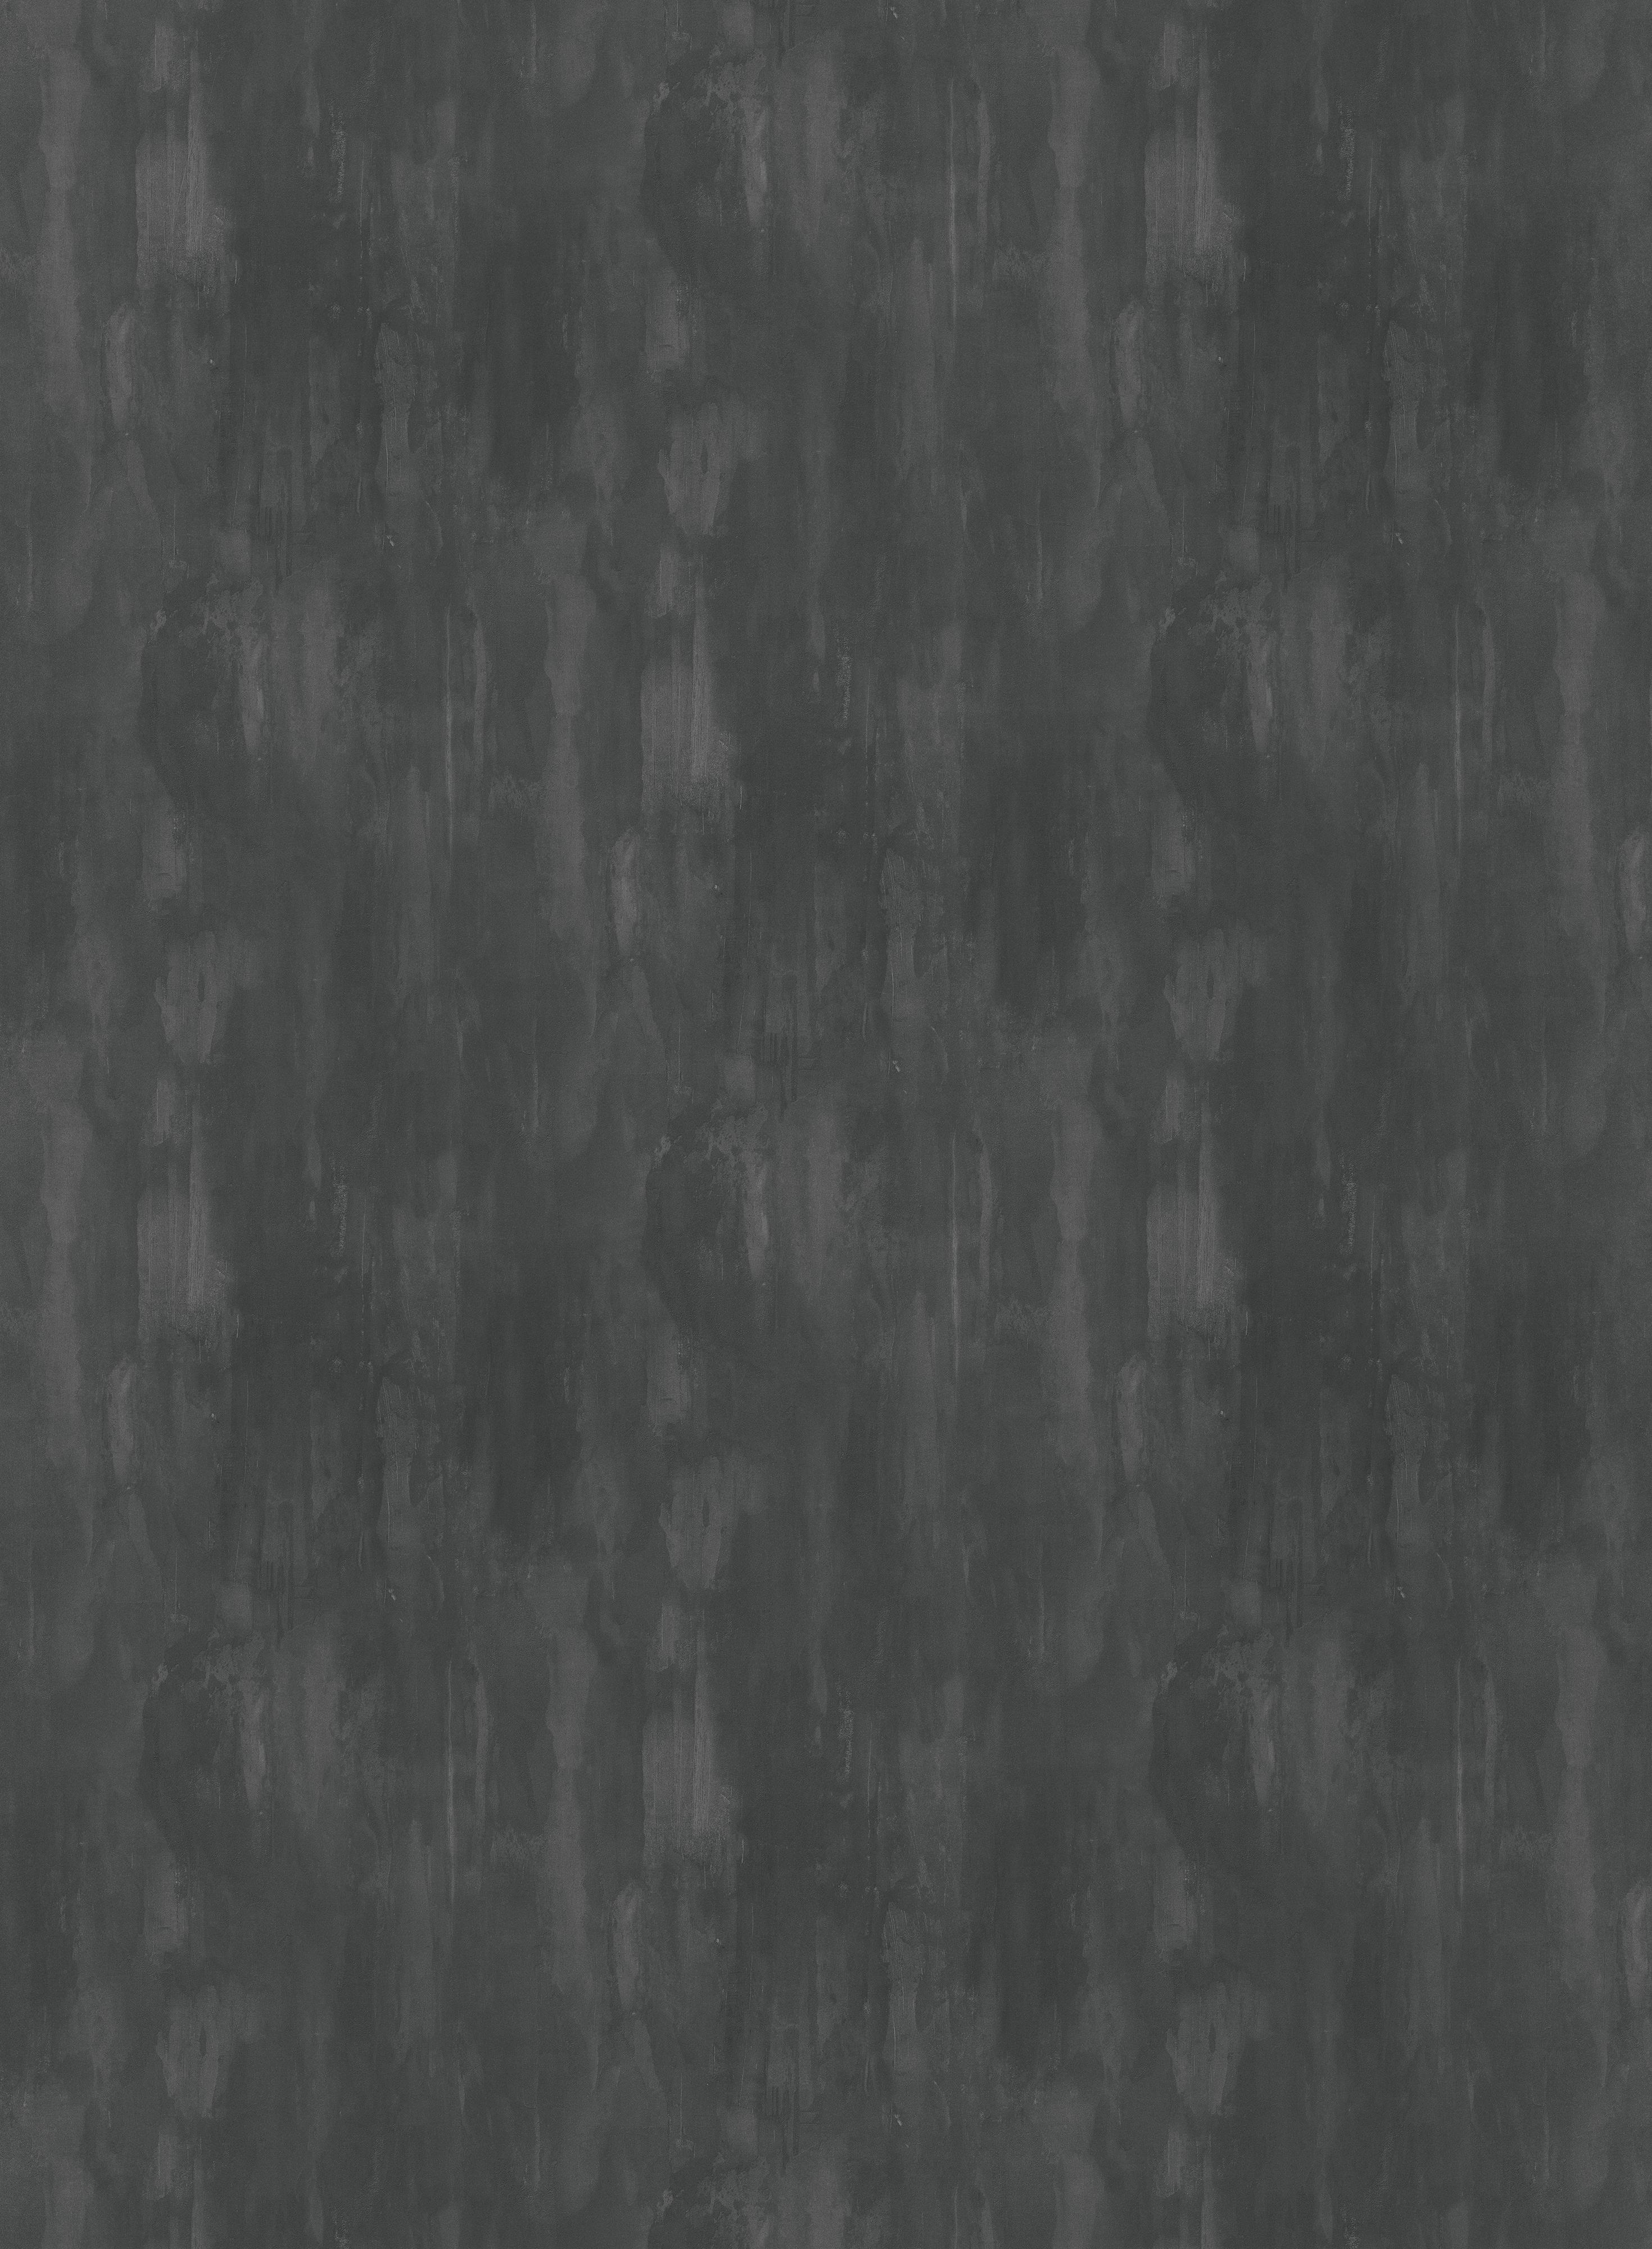 DecoLegno  FB67 Metallic, hele plaat afb. 2800x2070m/Tekenprogramma